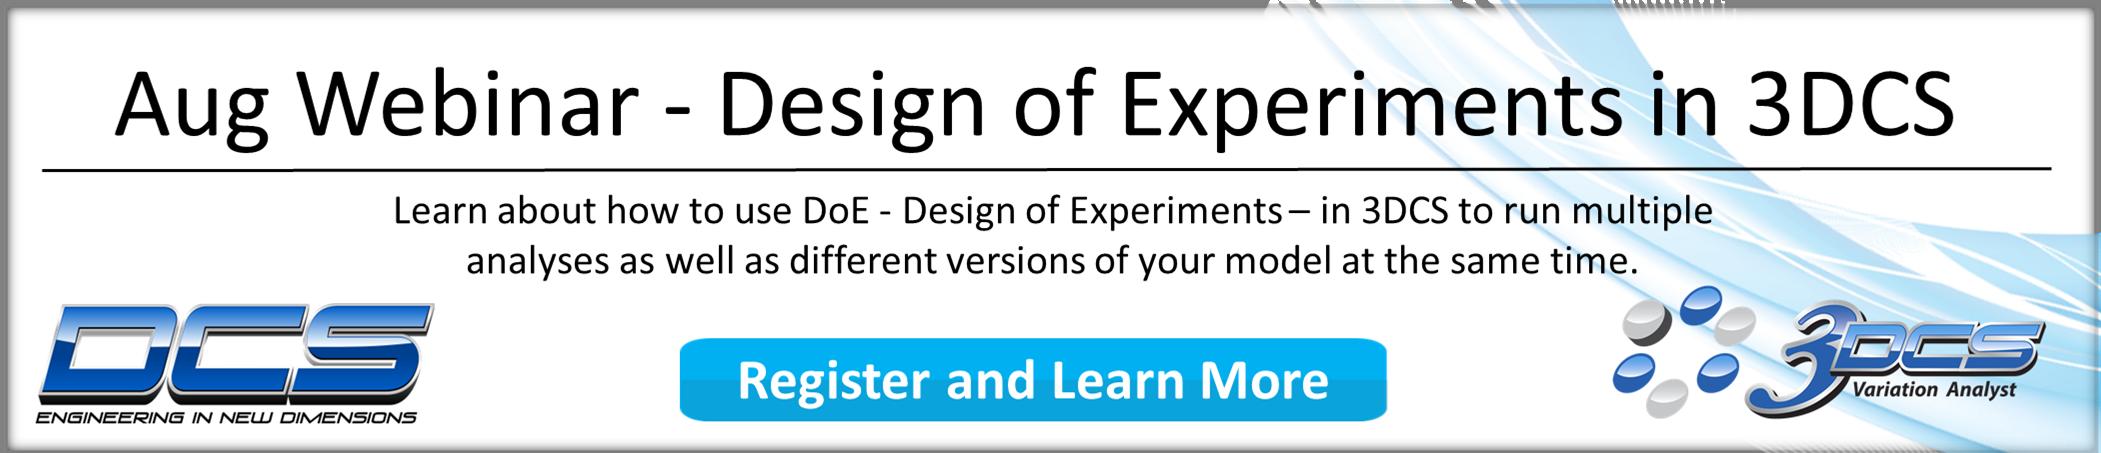 Aug Webinar - Design of Experiments in 3DCS